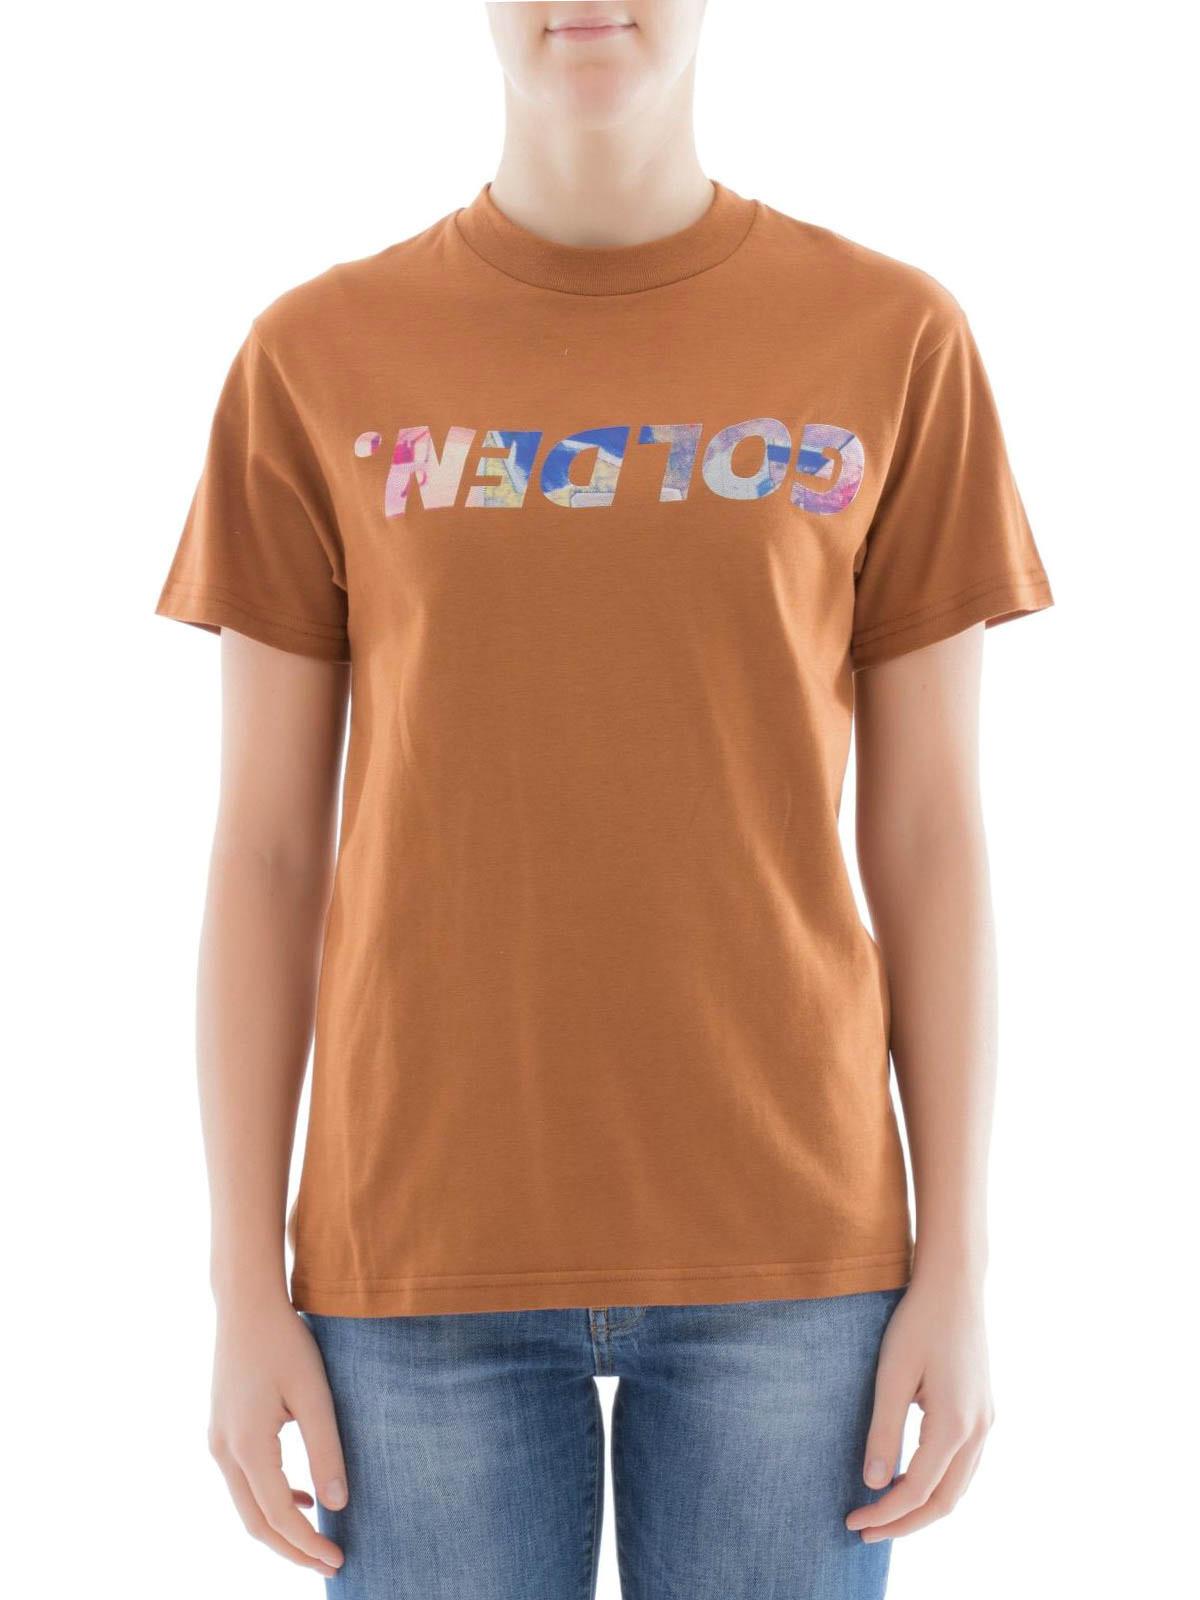 Logo print cotton t shirt by golden goose t shirts ikrix for Print logo on shirt